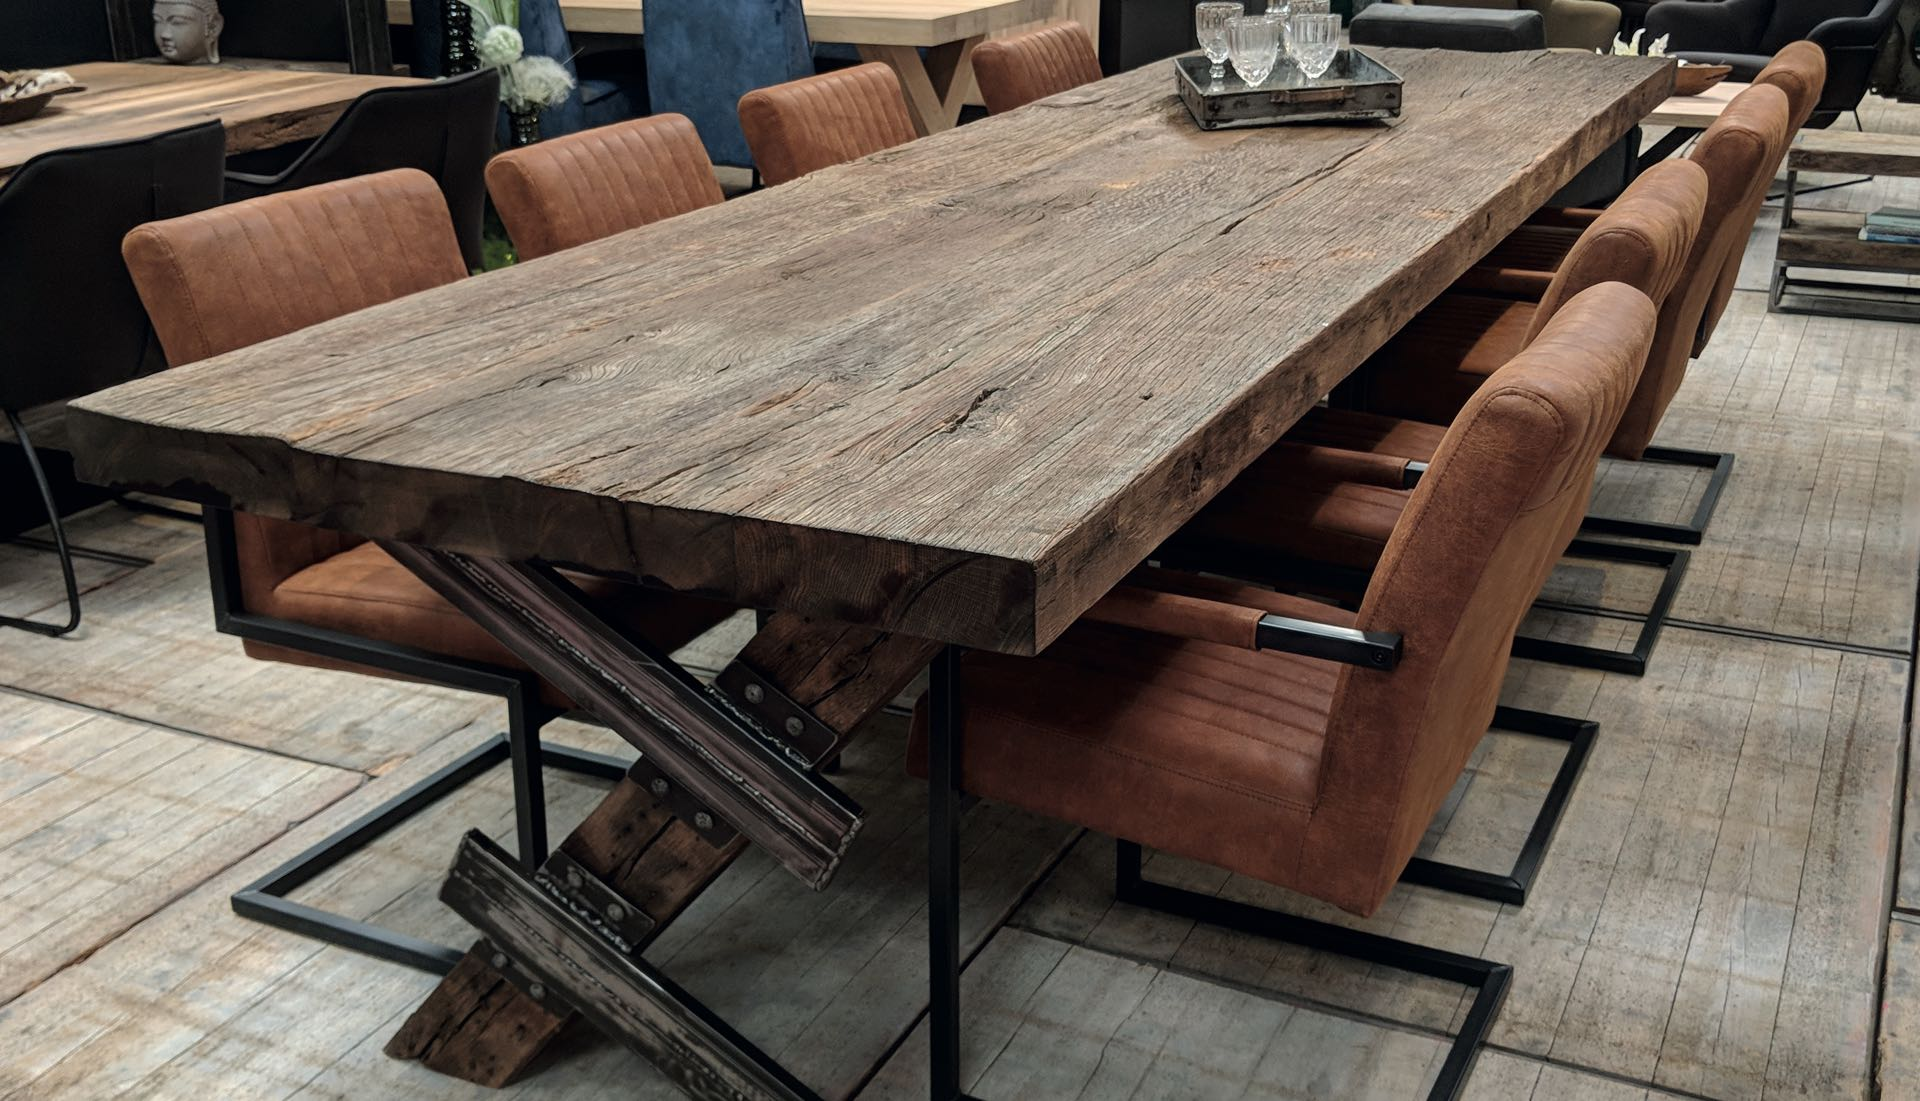 Altholz Tischplatte Amsterdam